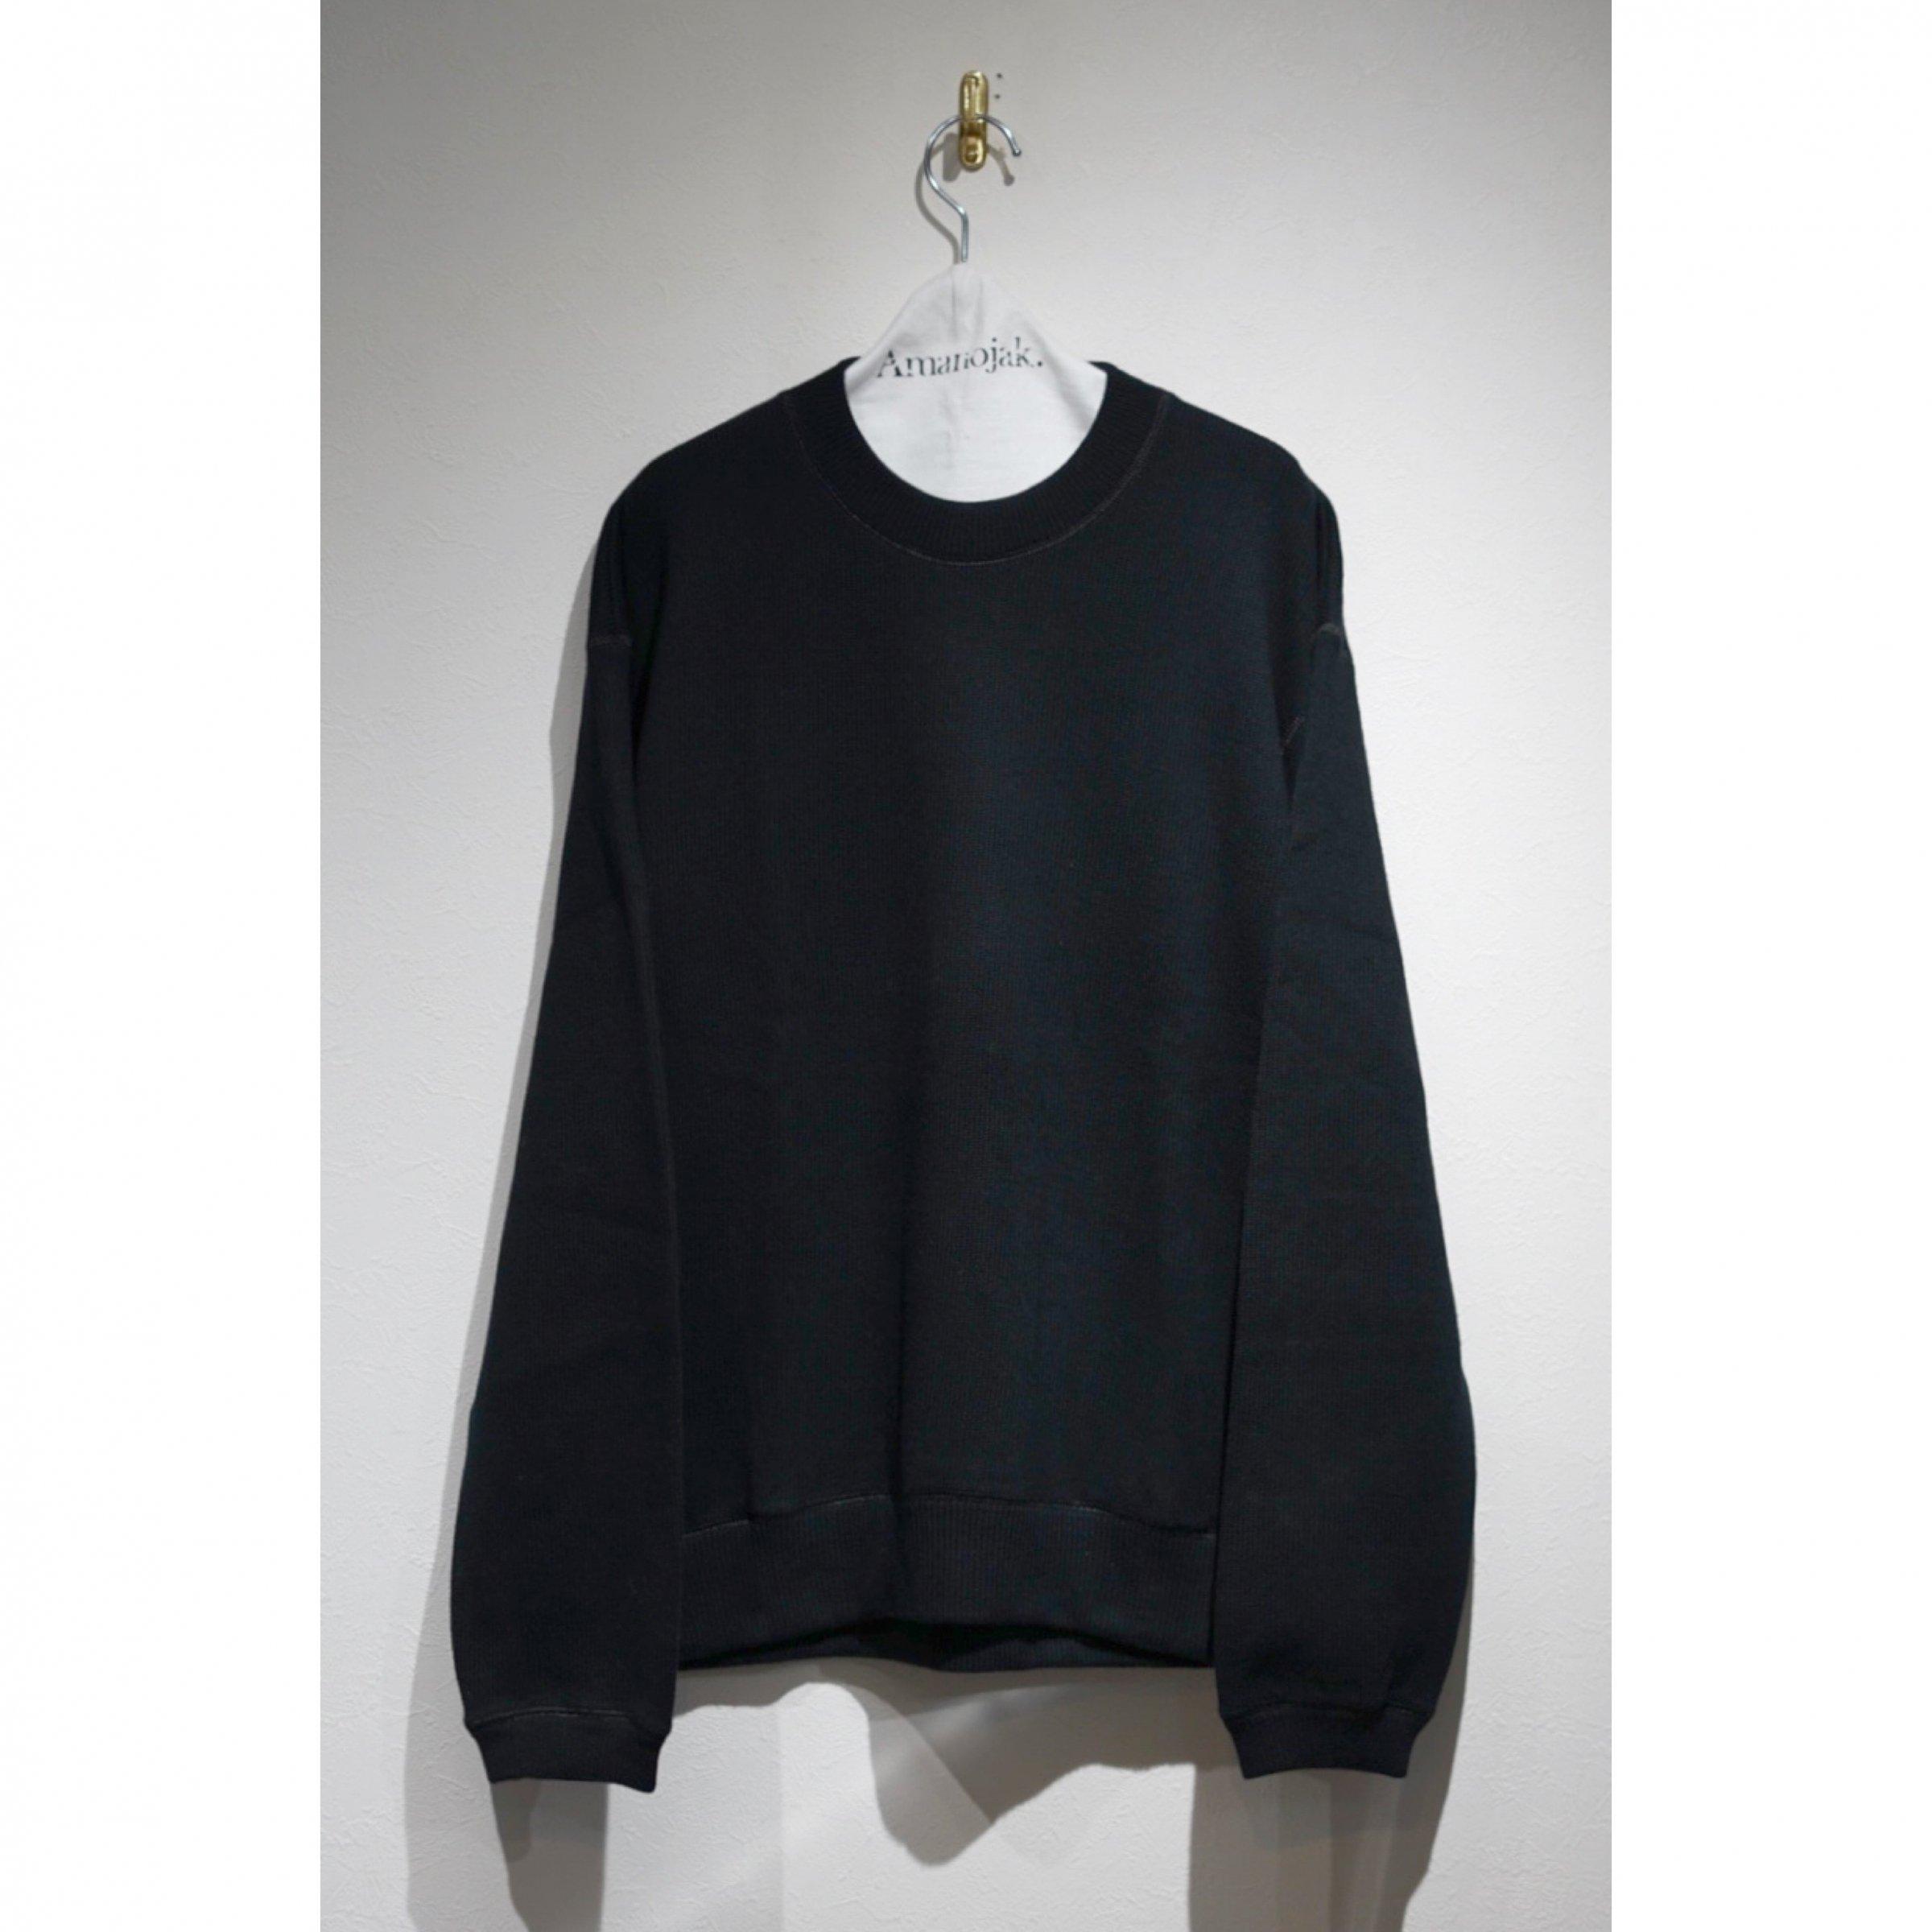 CURLY-LUMPY SWEATER BLACK